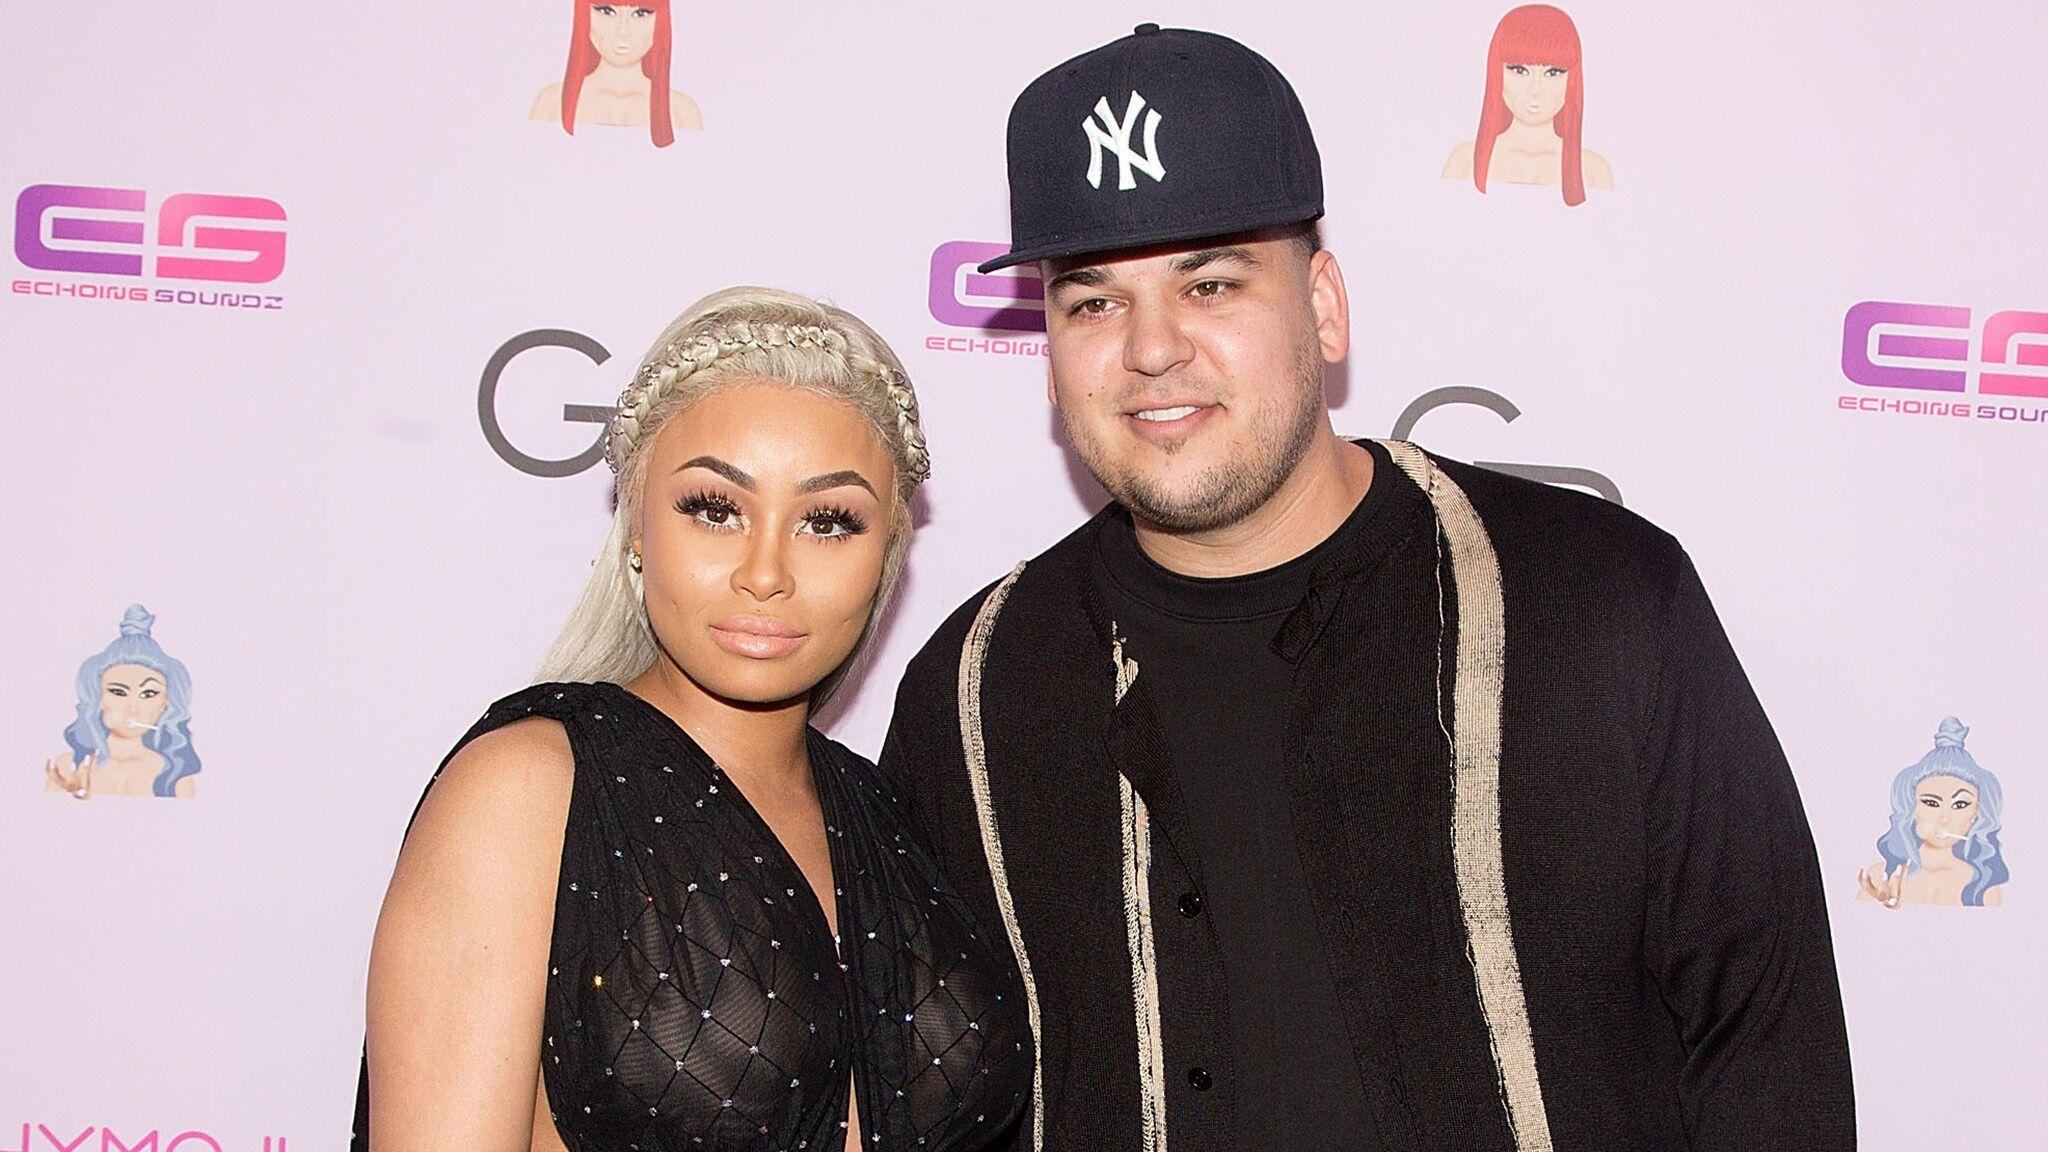 59cf5a02b8ca6 Rob Kardashian et Blac Chyna ont enfin trouvé un accord pour la garde de  leur fille ! - Voici